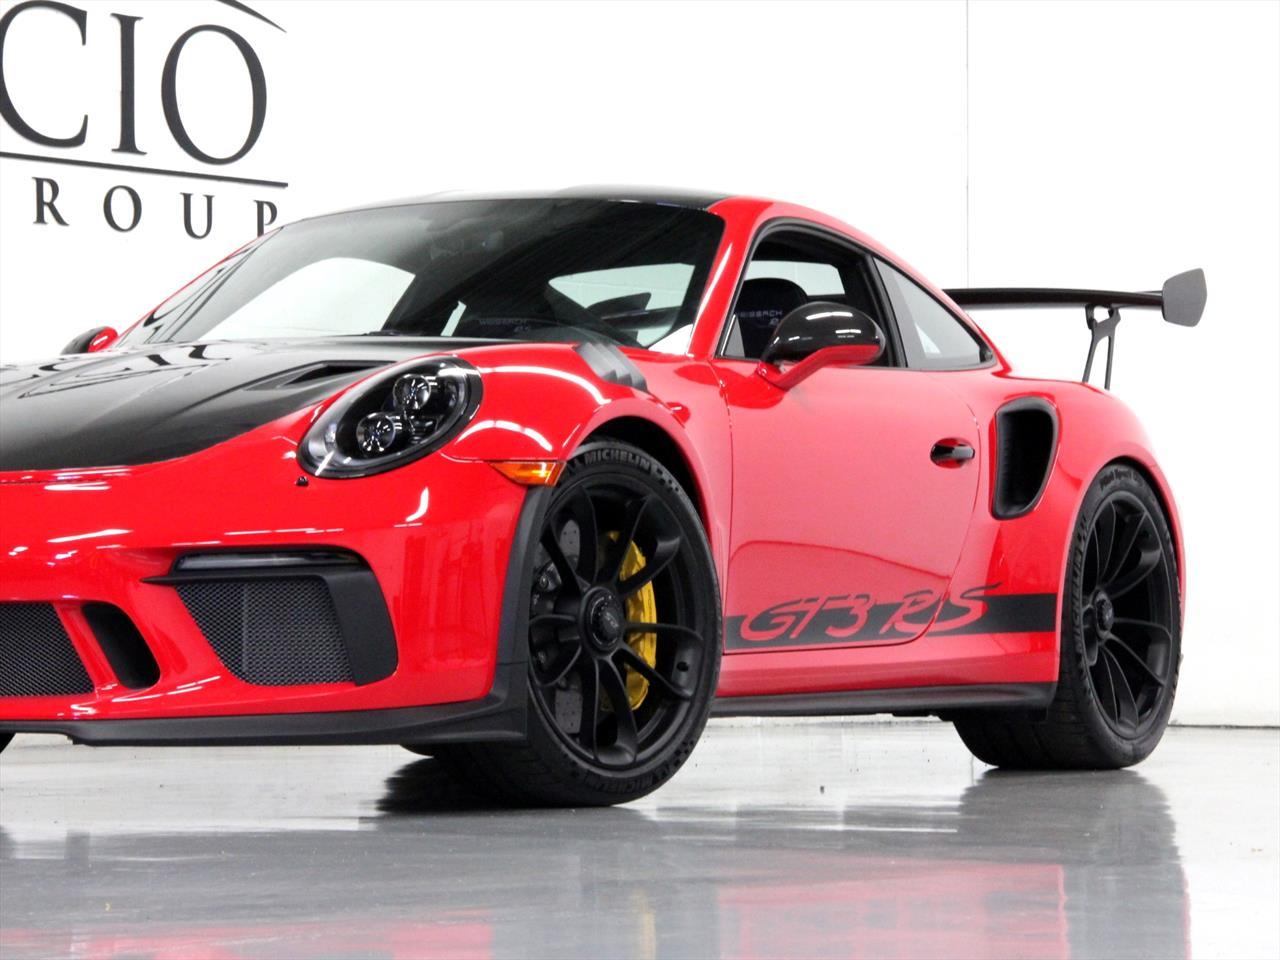 2019 Porsche 911 Gt3 Rs W Weissach Package